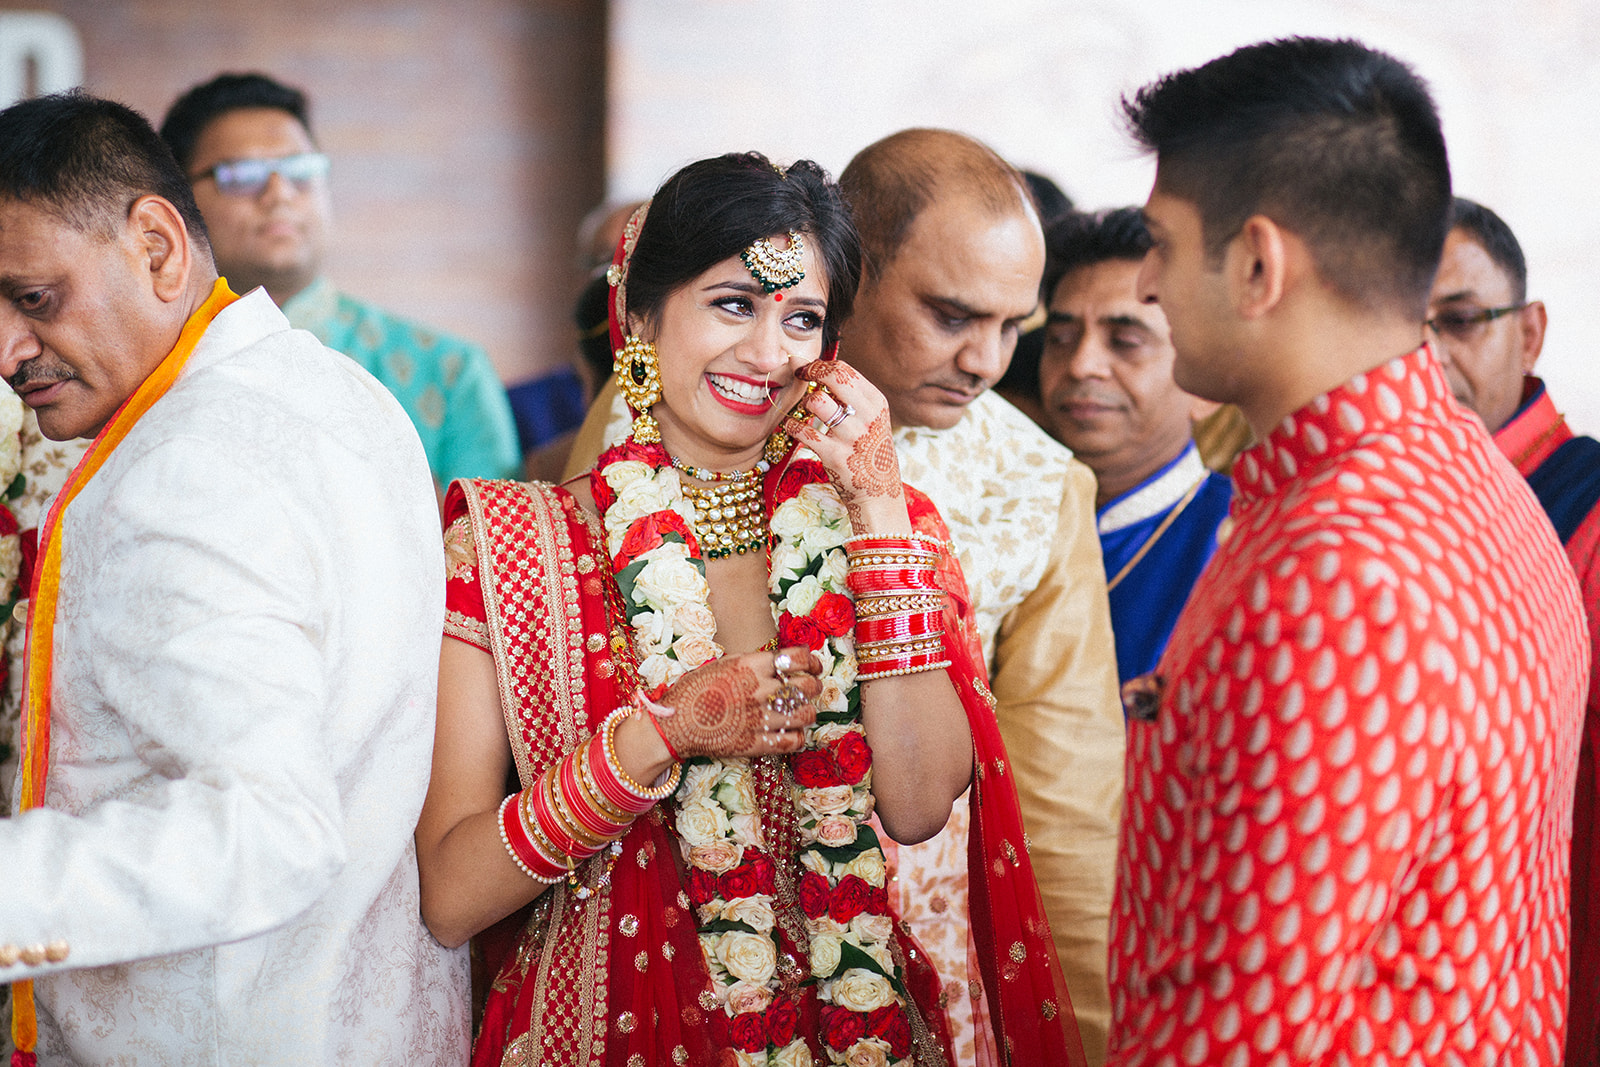 Le Cape Weddings - Vidai - Rimi and Rohun -18.jpg